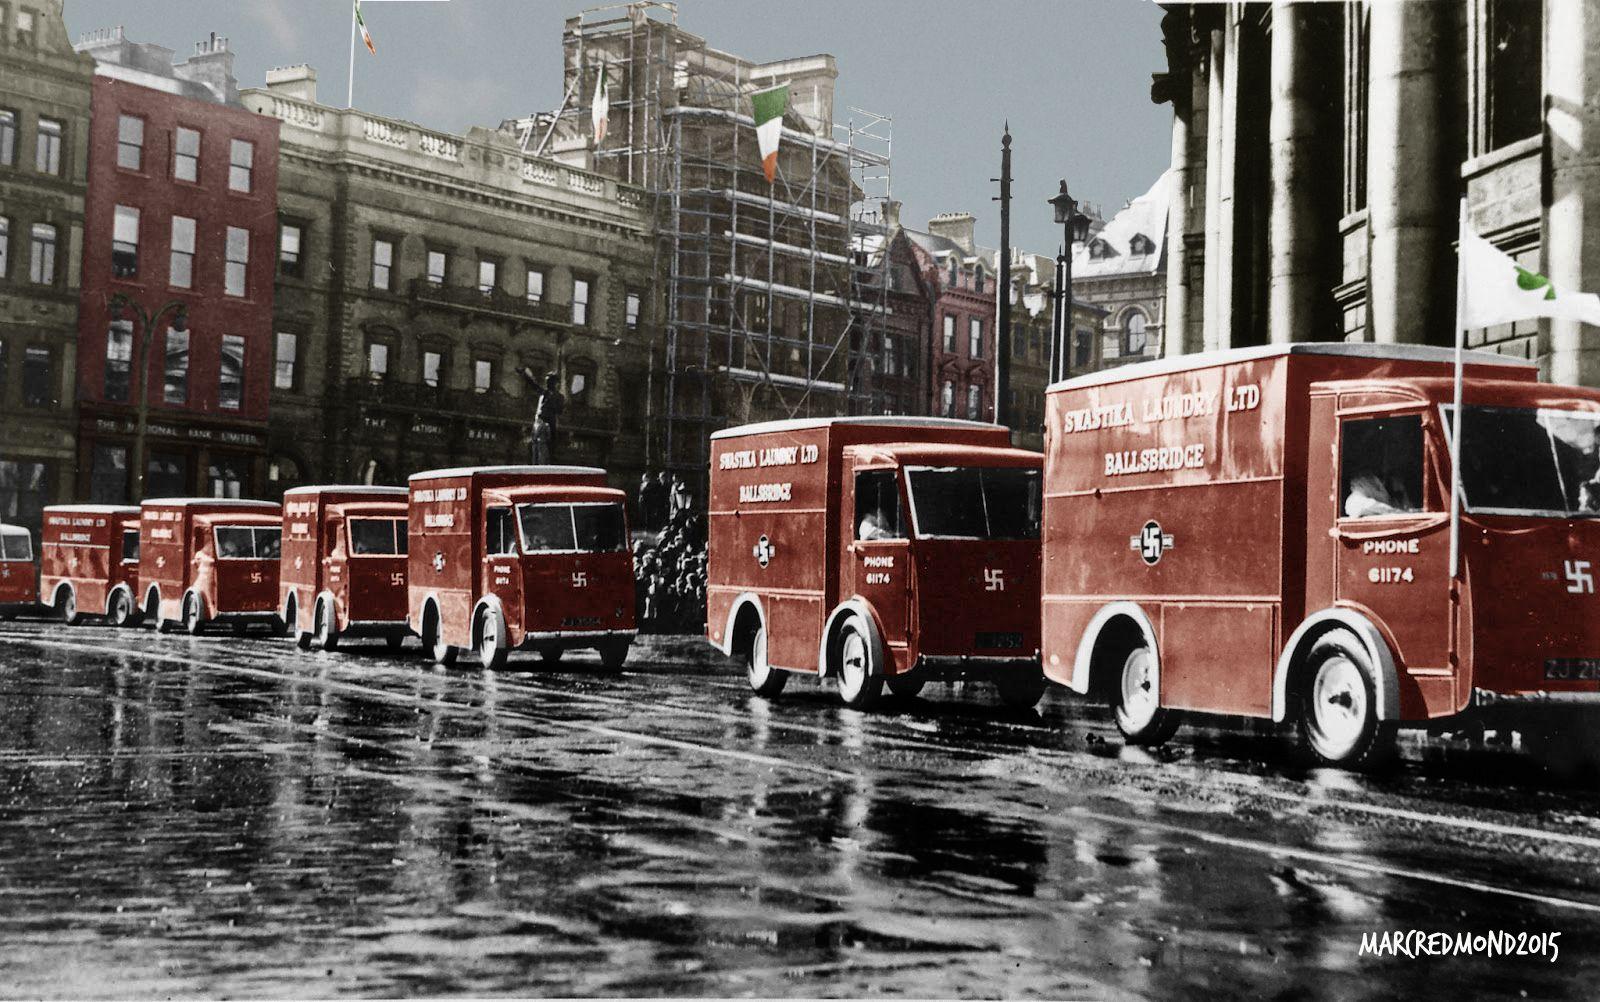 eeeb4c604f Swastika Laundry vans cross College Green in Dublin